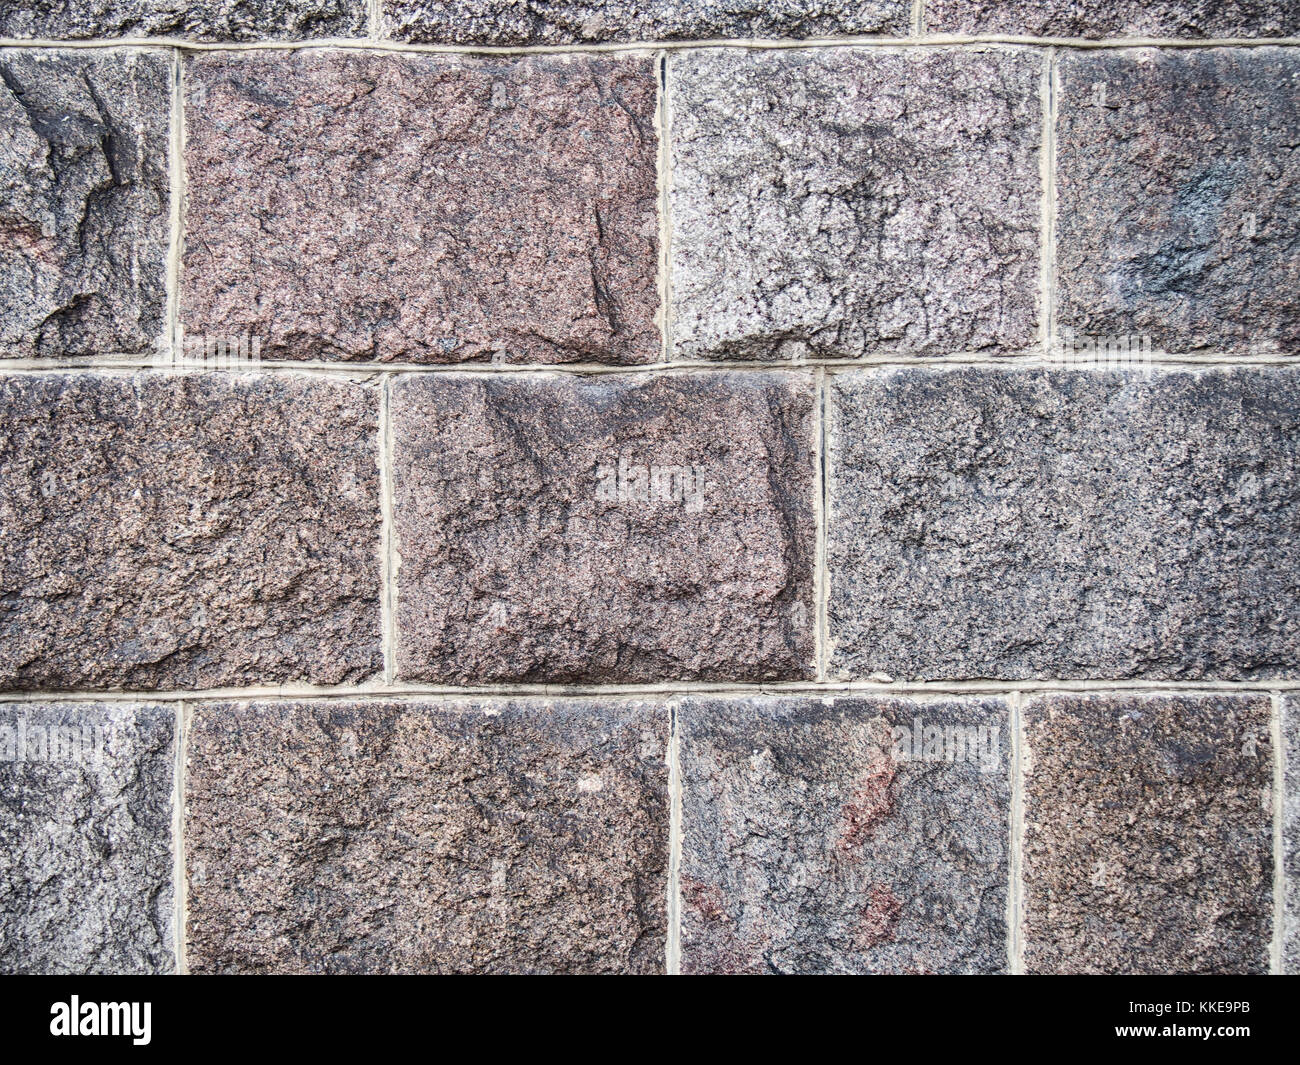 Granite masonry wall background - Stock Image